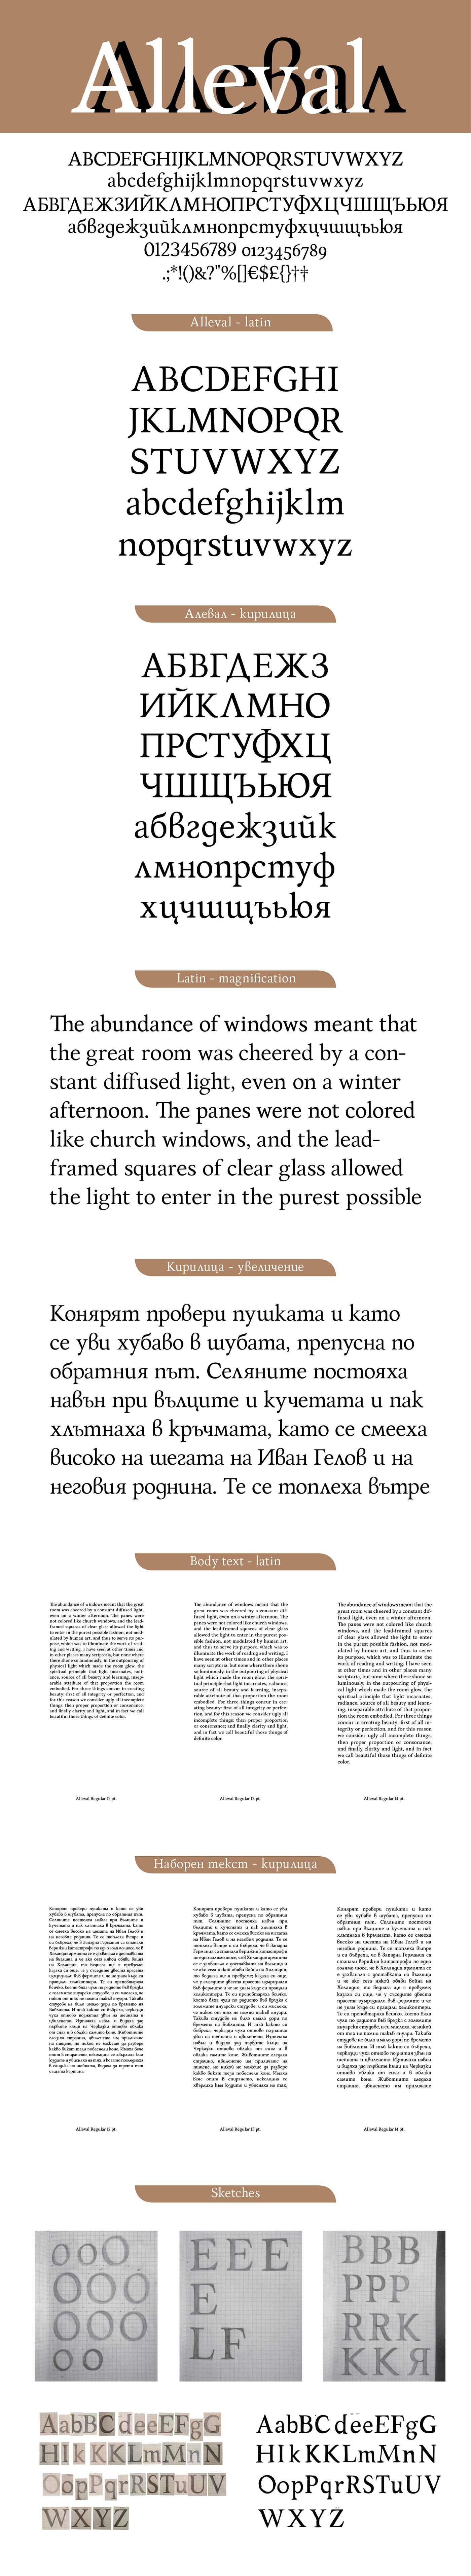 type type design Typeface font Bulgarian Cyrillic bulgarian Cyrillic Latin